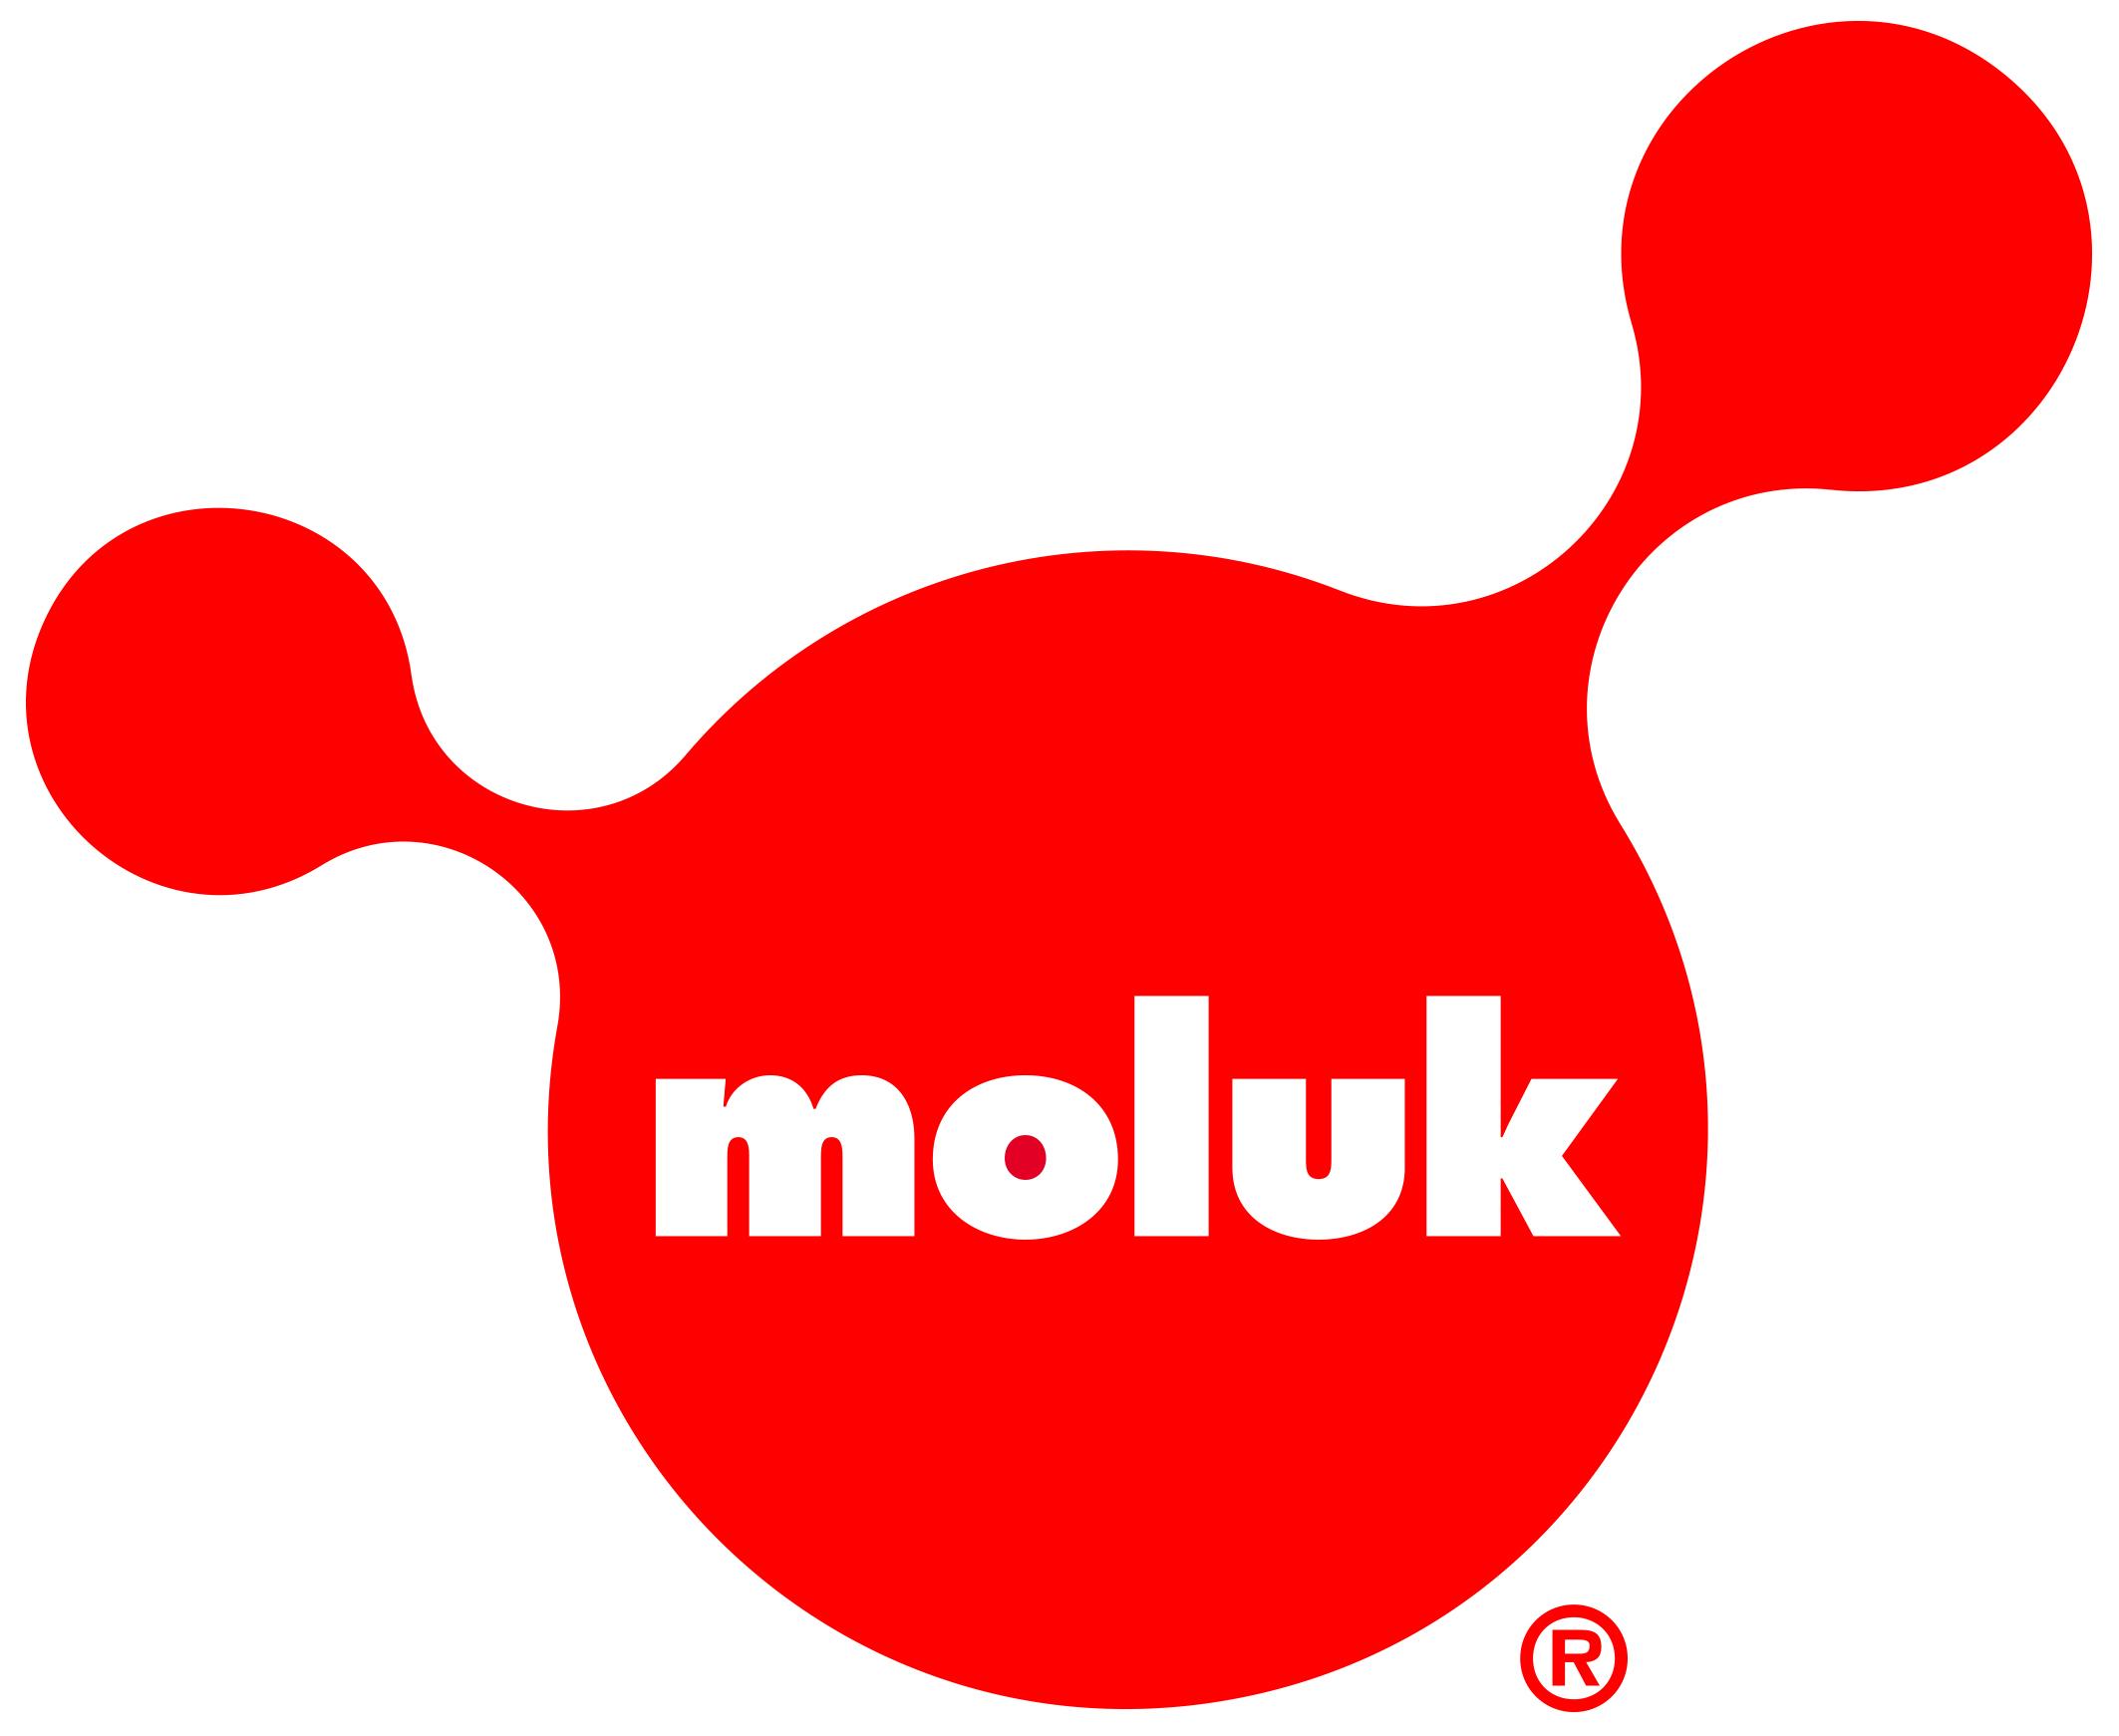 moluk_logo